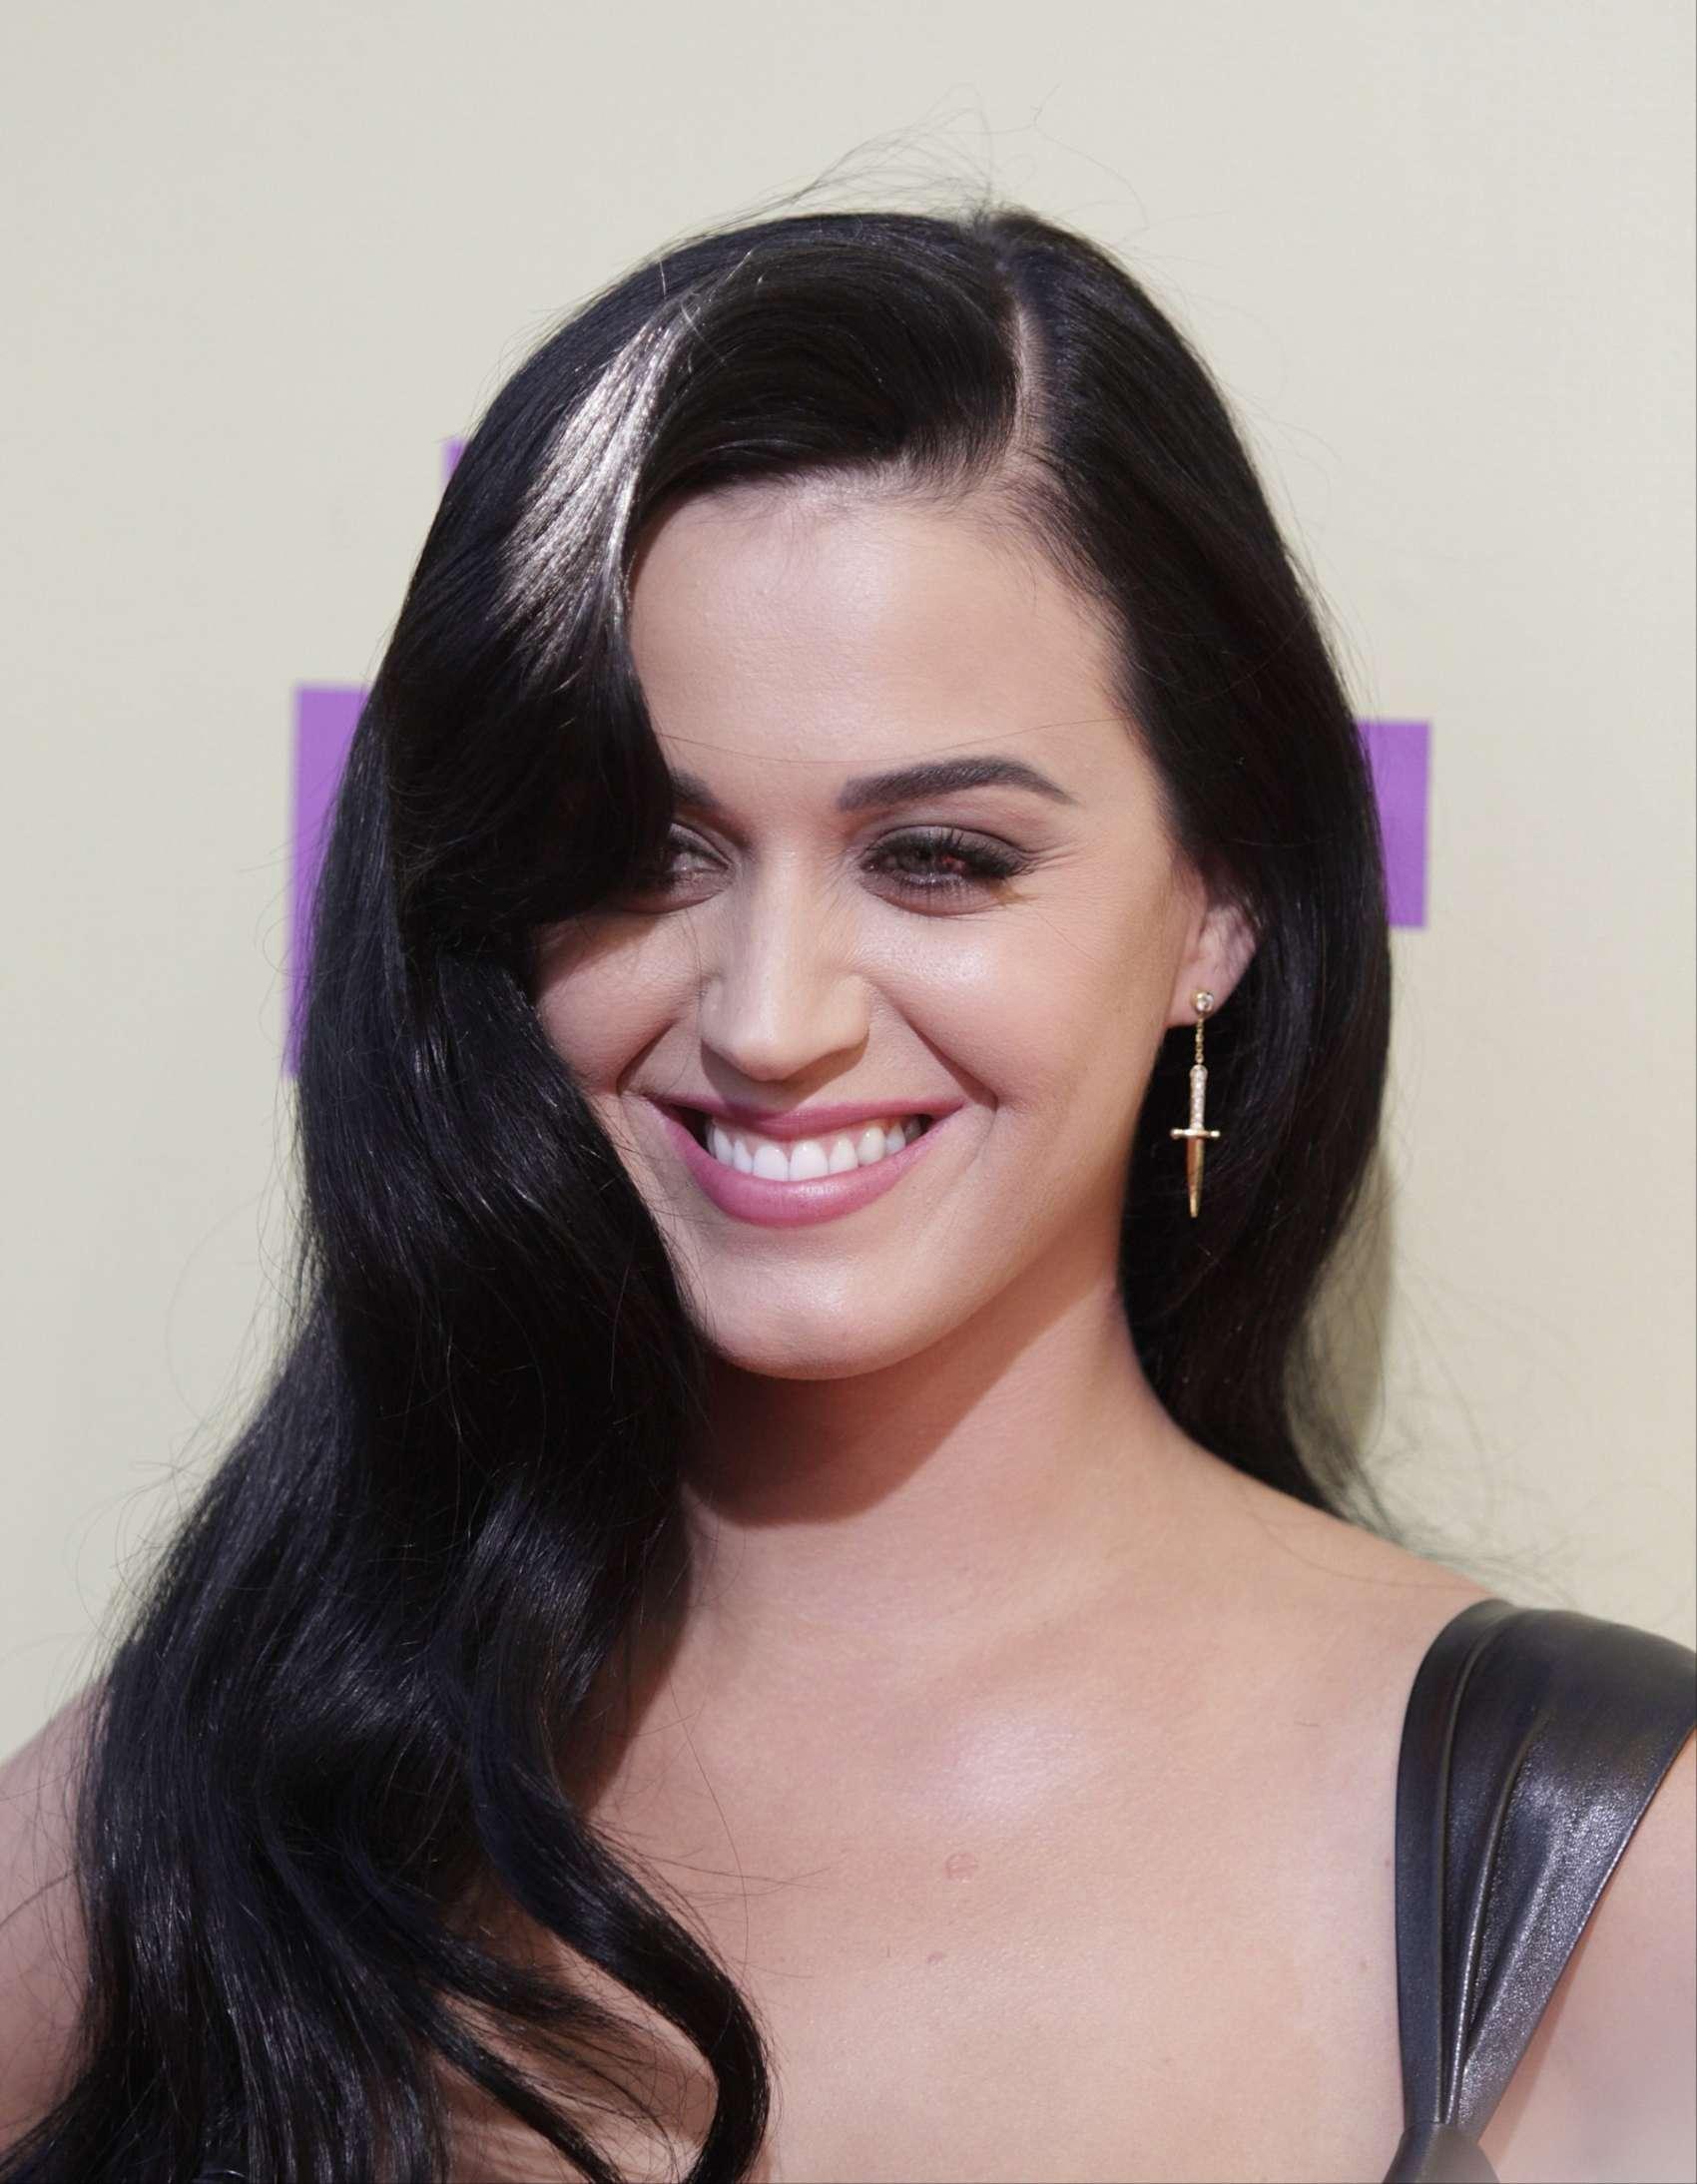 Katy Perry Hot-13